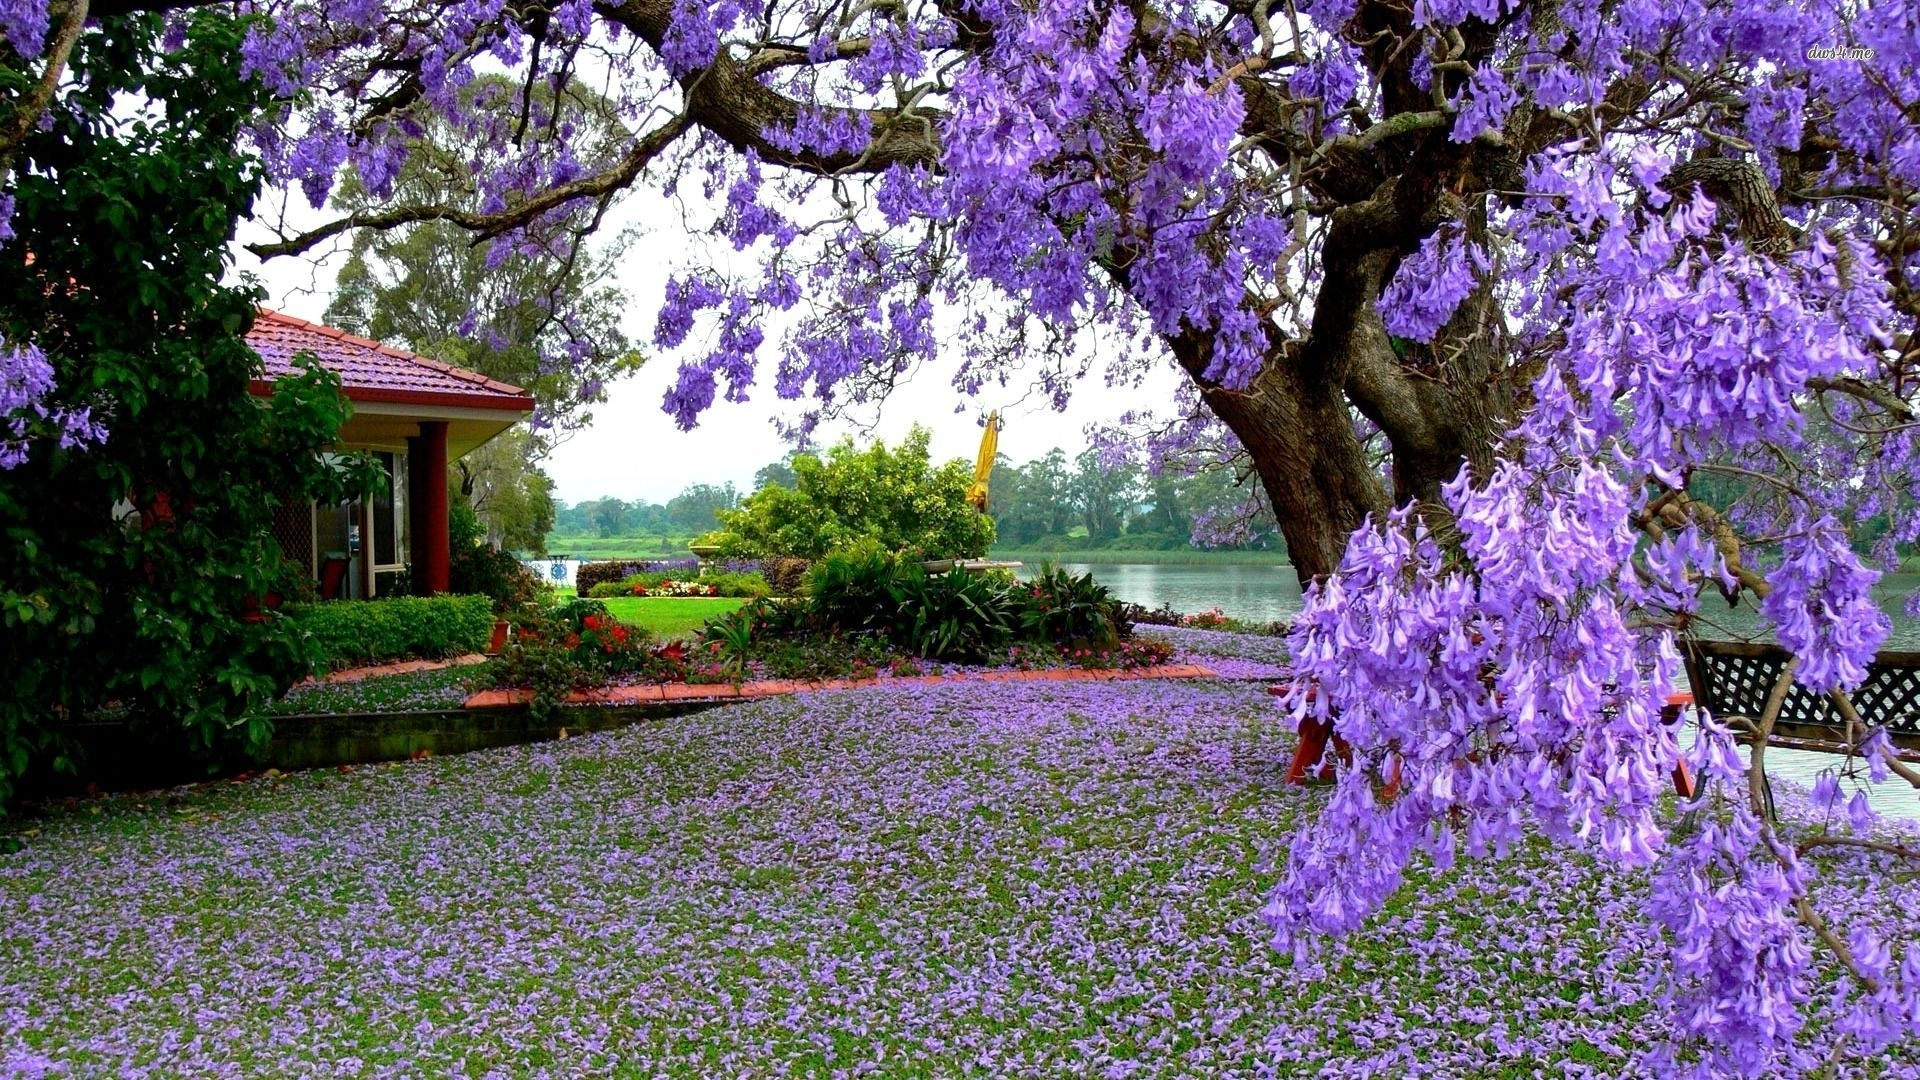 Title : Flower Garden Wallpapers   Best Wallpapers. Dimension : 1920 X  1080. File Type : JPG/JPEG